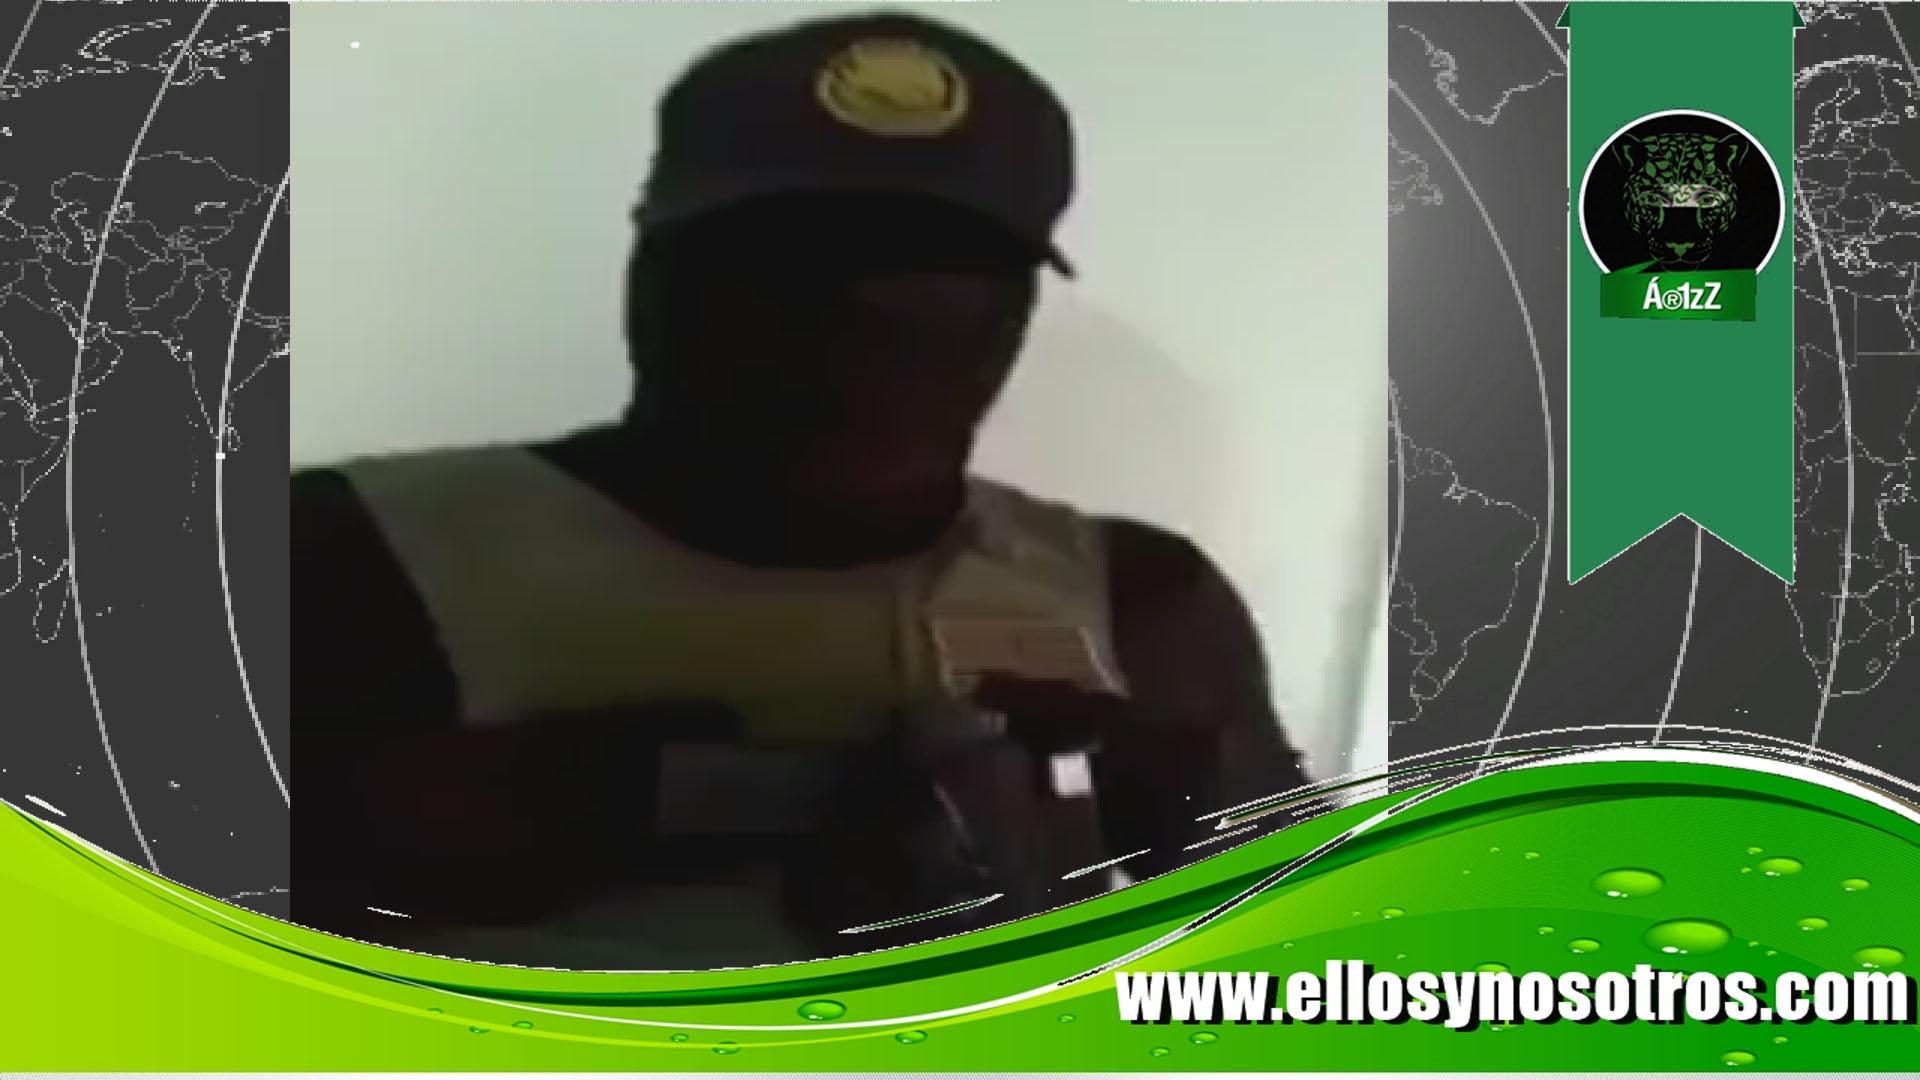 Reynosa: ofrecen recompensas millonarias por cabezas narcos rivales en un video difundido en Facebook